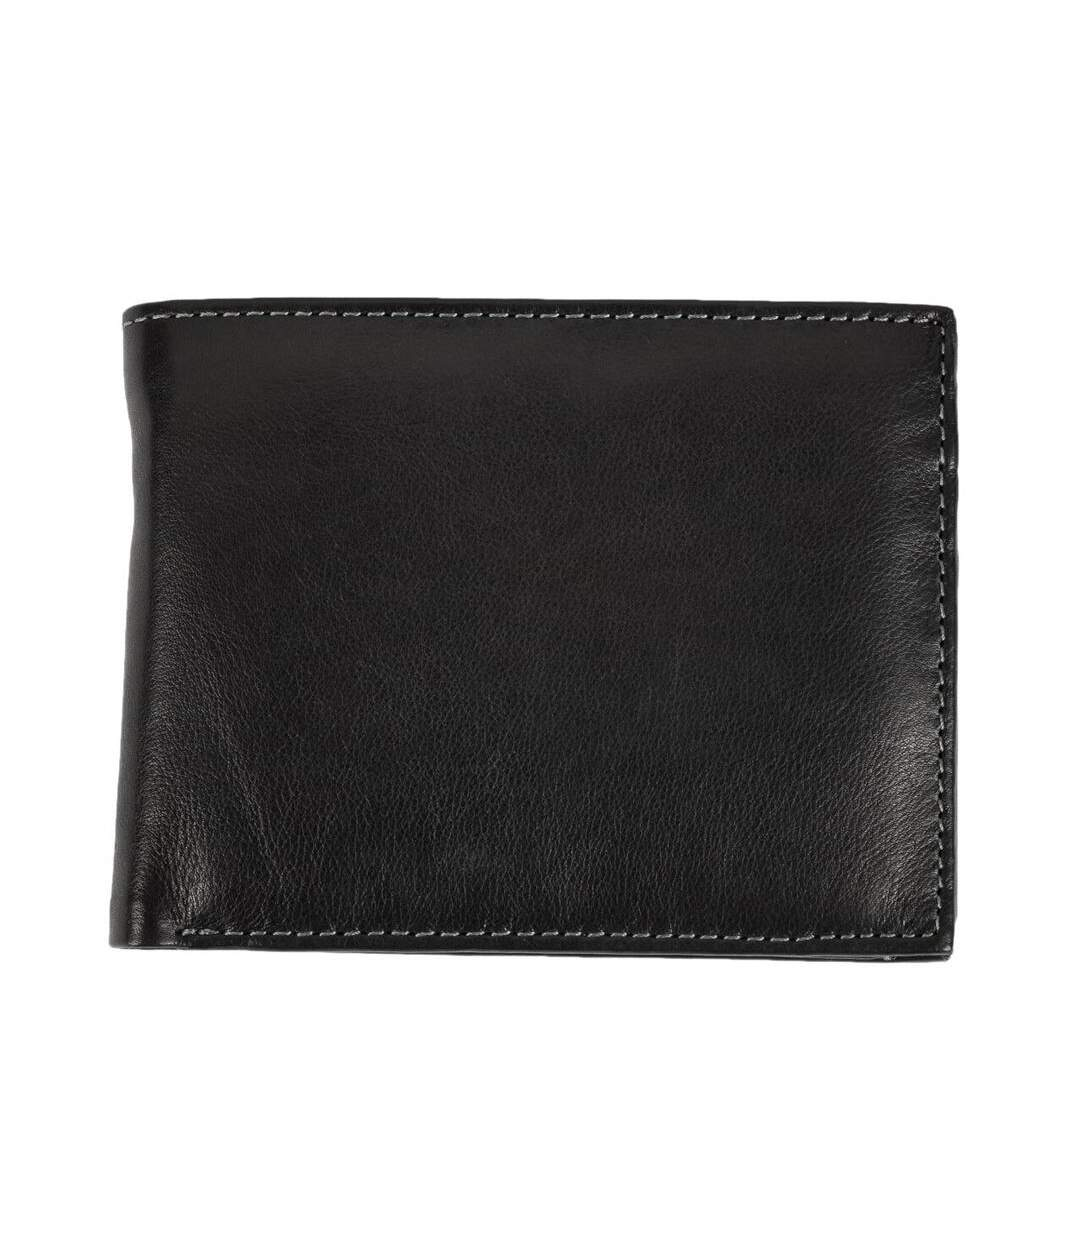 Eastern Counties Leather - Portefeuille À Trois Volets - Homme (Noir) - UTEL323